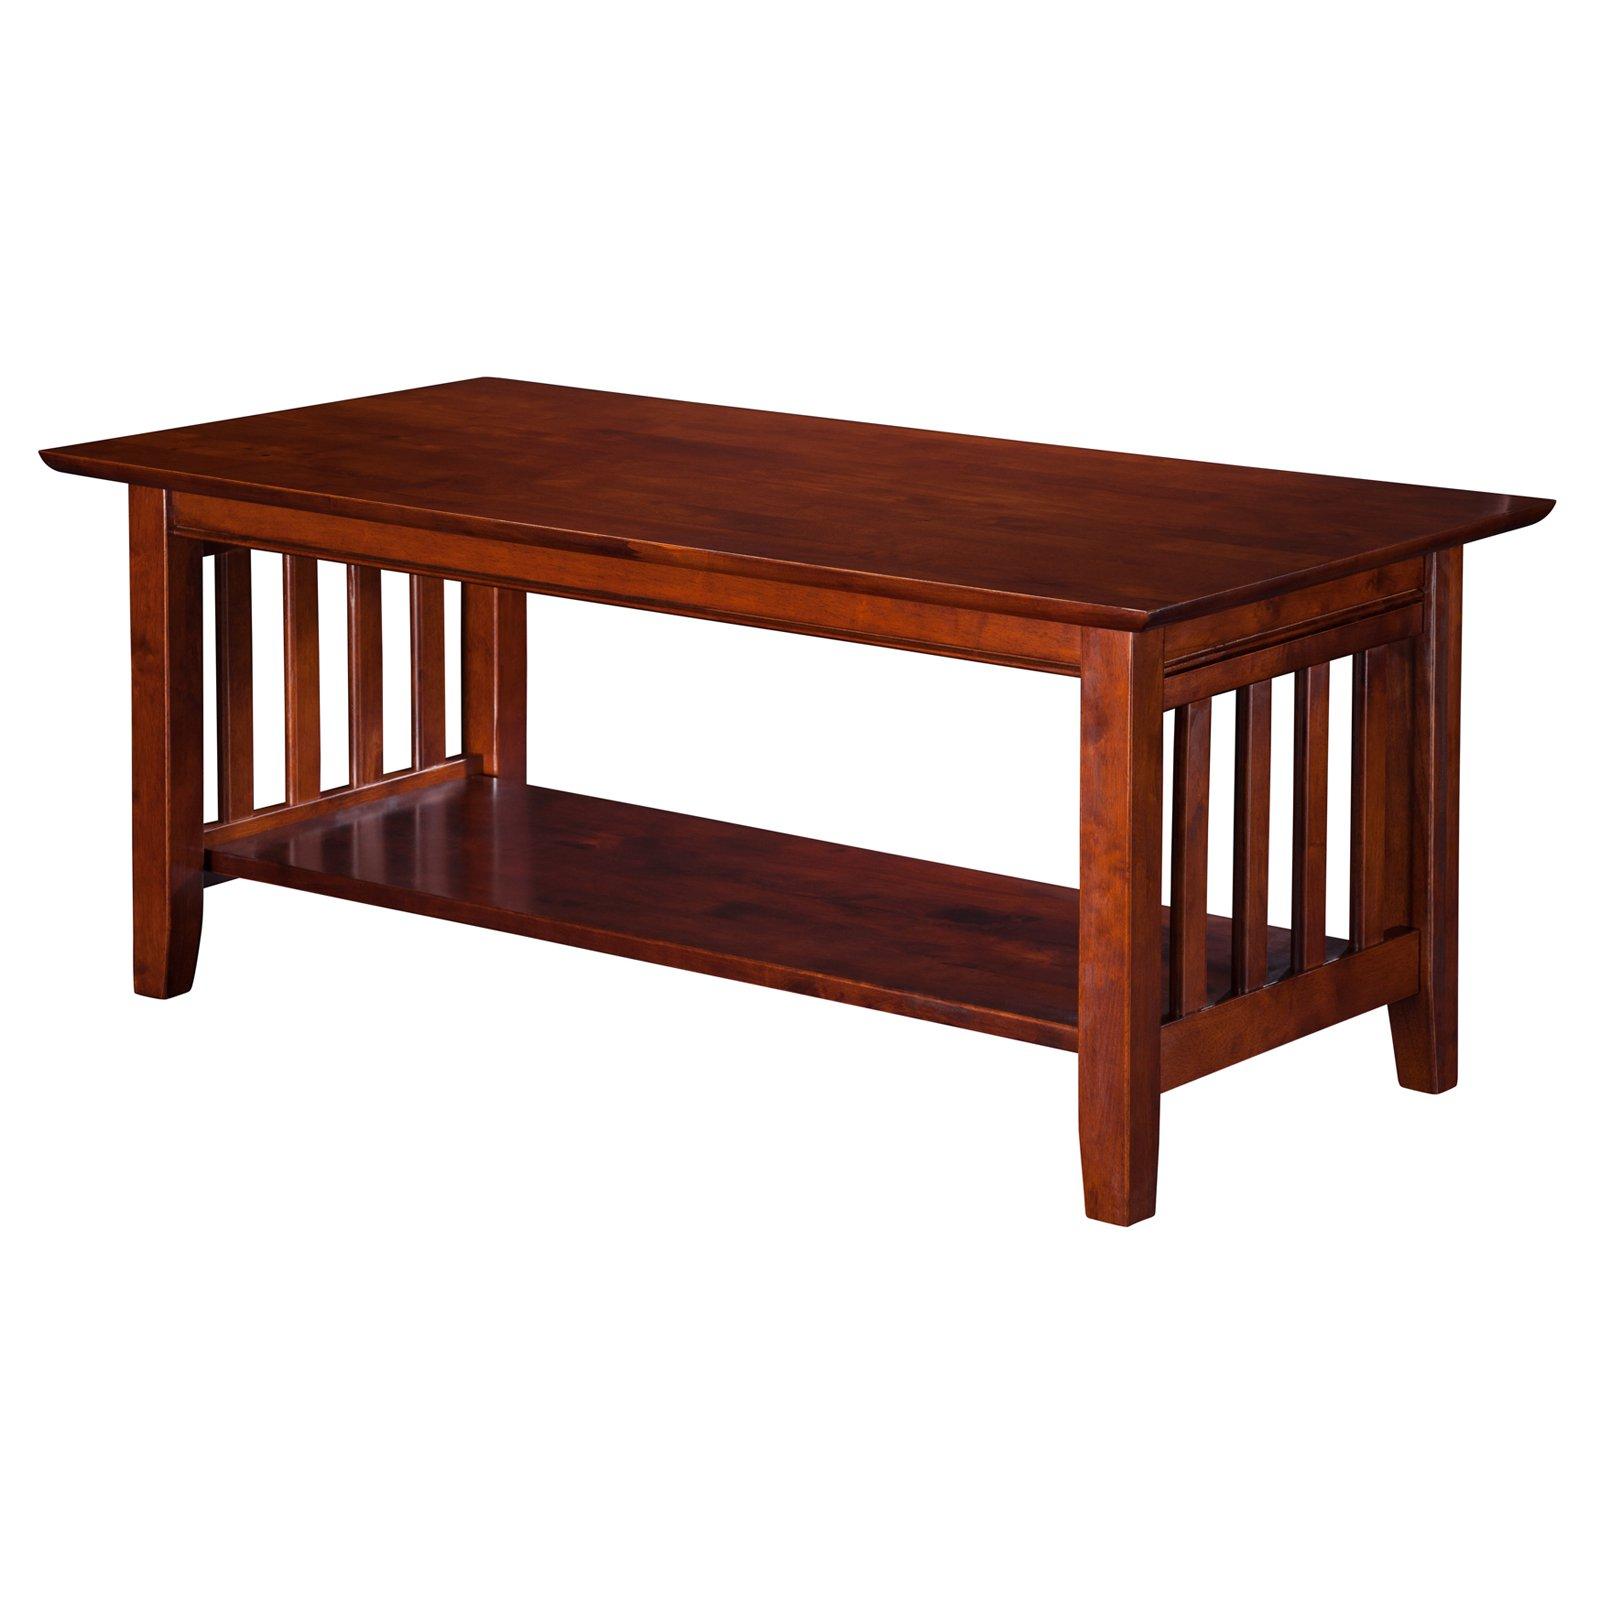 Atlantic Furniture Mission Coffee Table Atlantic Furniture Walnut Coffee Table Coffee And End Tables [ 1600 x 1600 Pixel ]